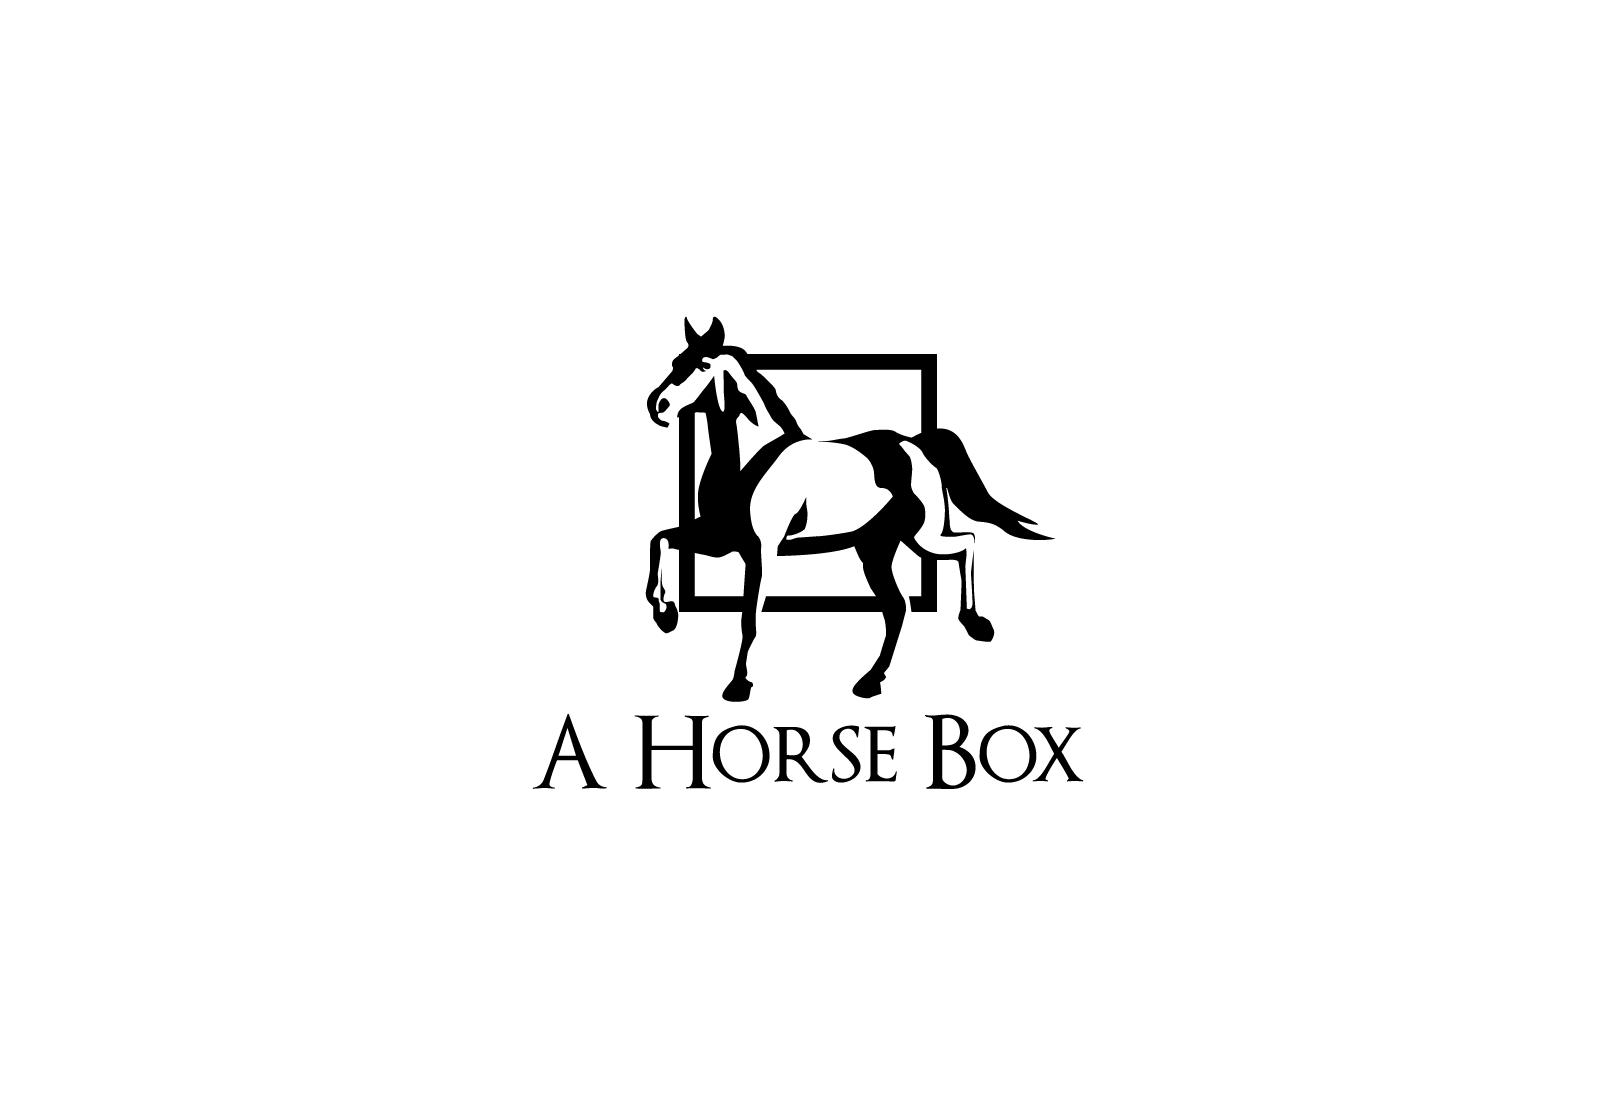 A Horse Box needs a logo